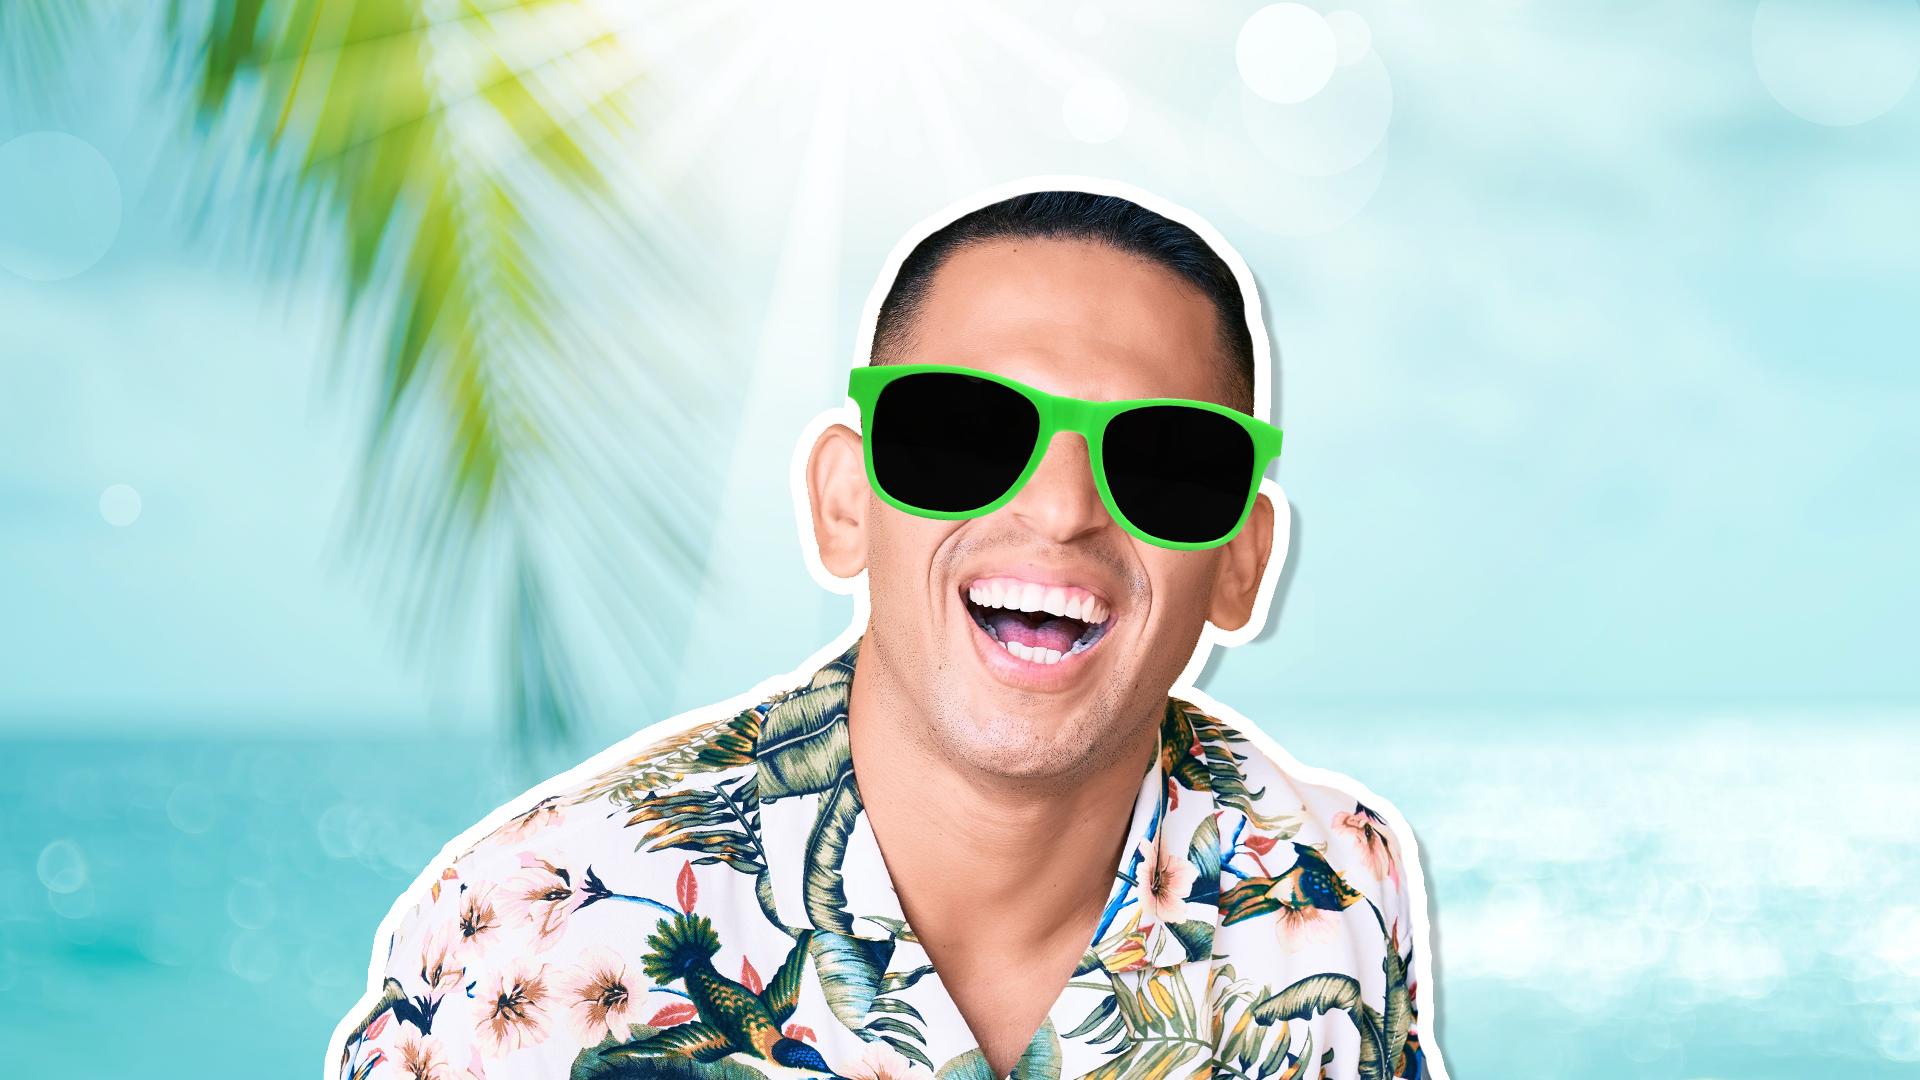 A man in a Hawaiian shirt